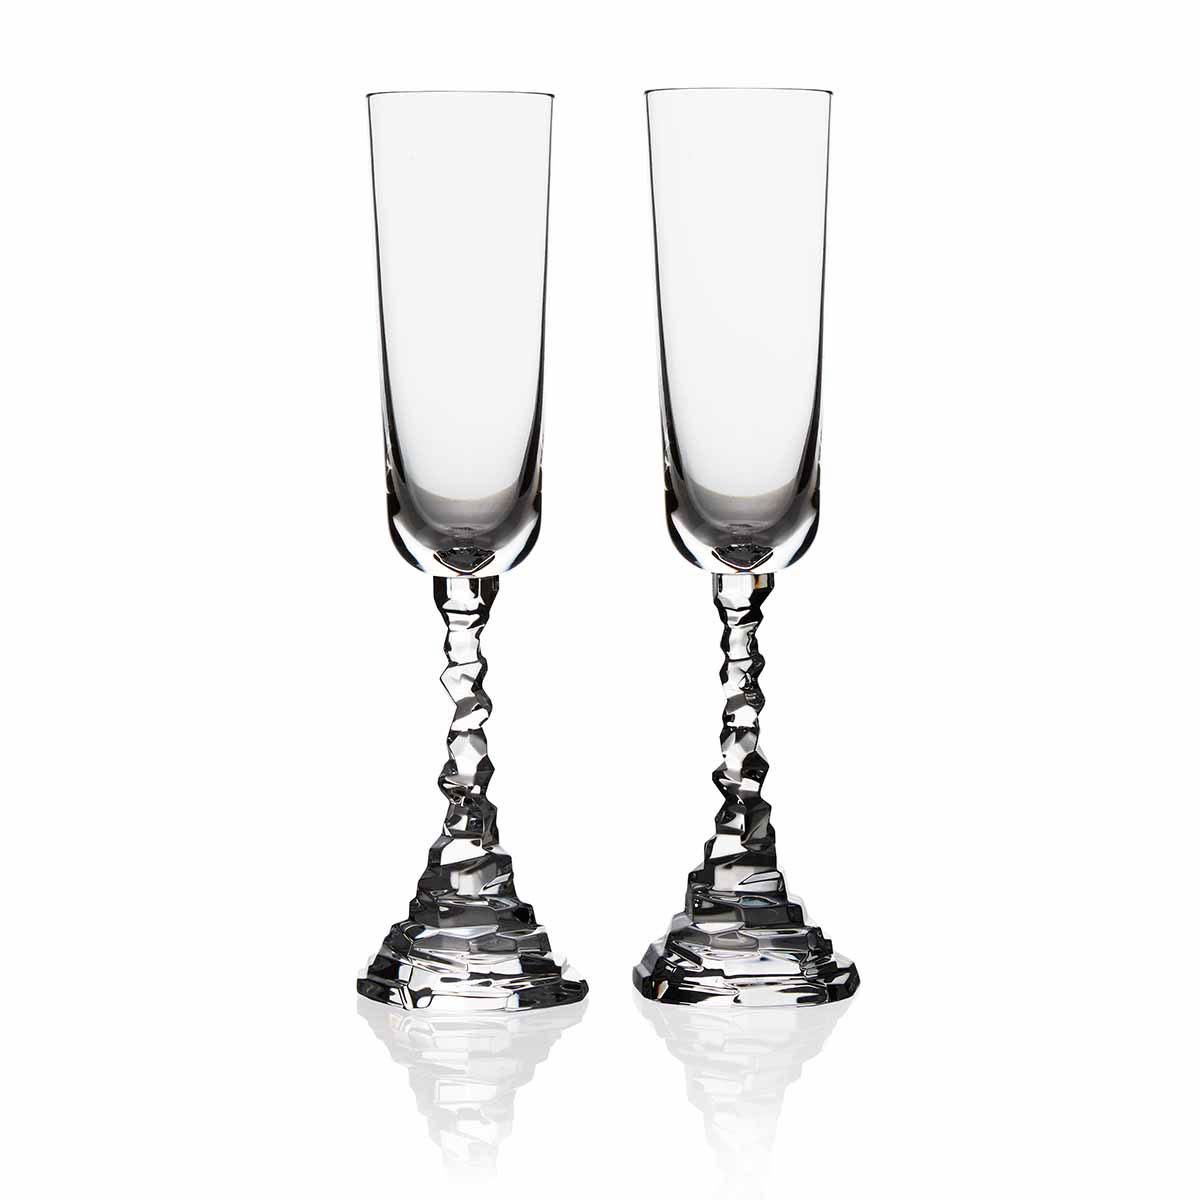 Michael Aram, Rock Champagne Crystal Flute, Pair